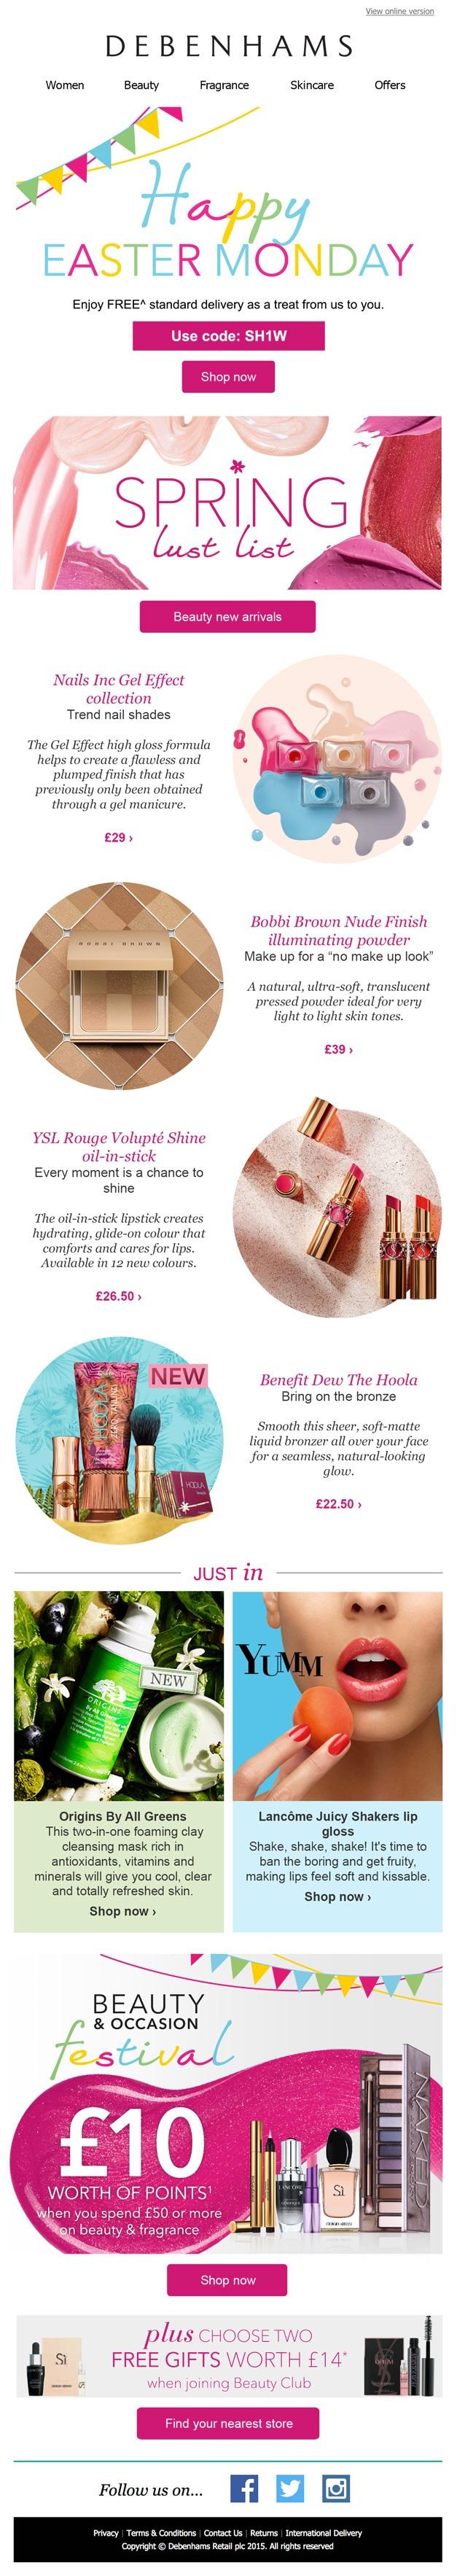 47155_Wk31_Tuesday_BeautyGossip_UK4a.jpg